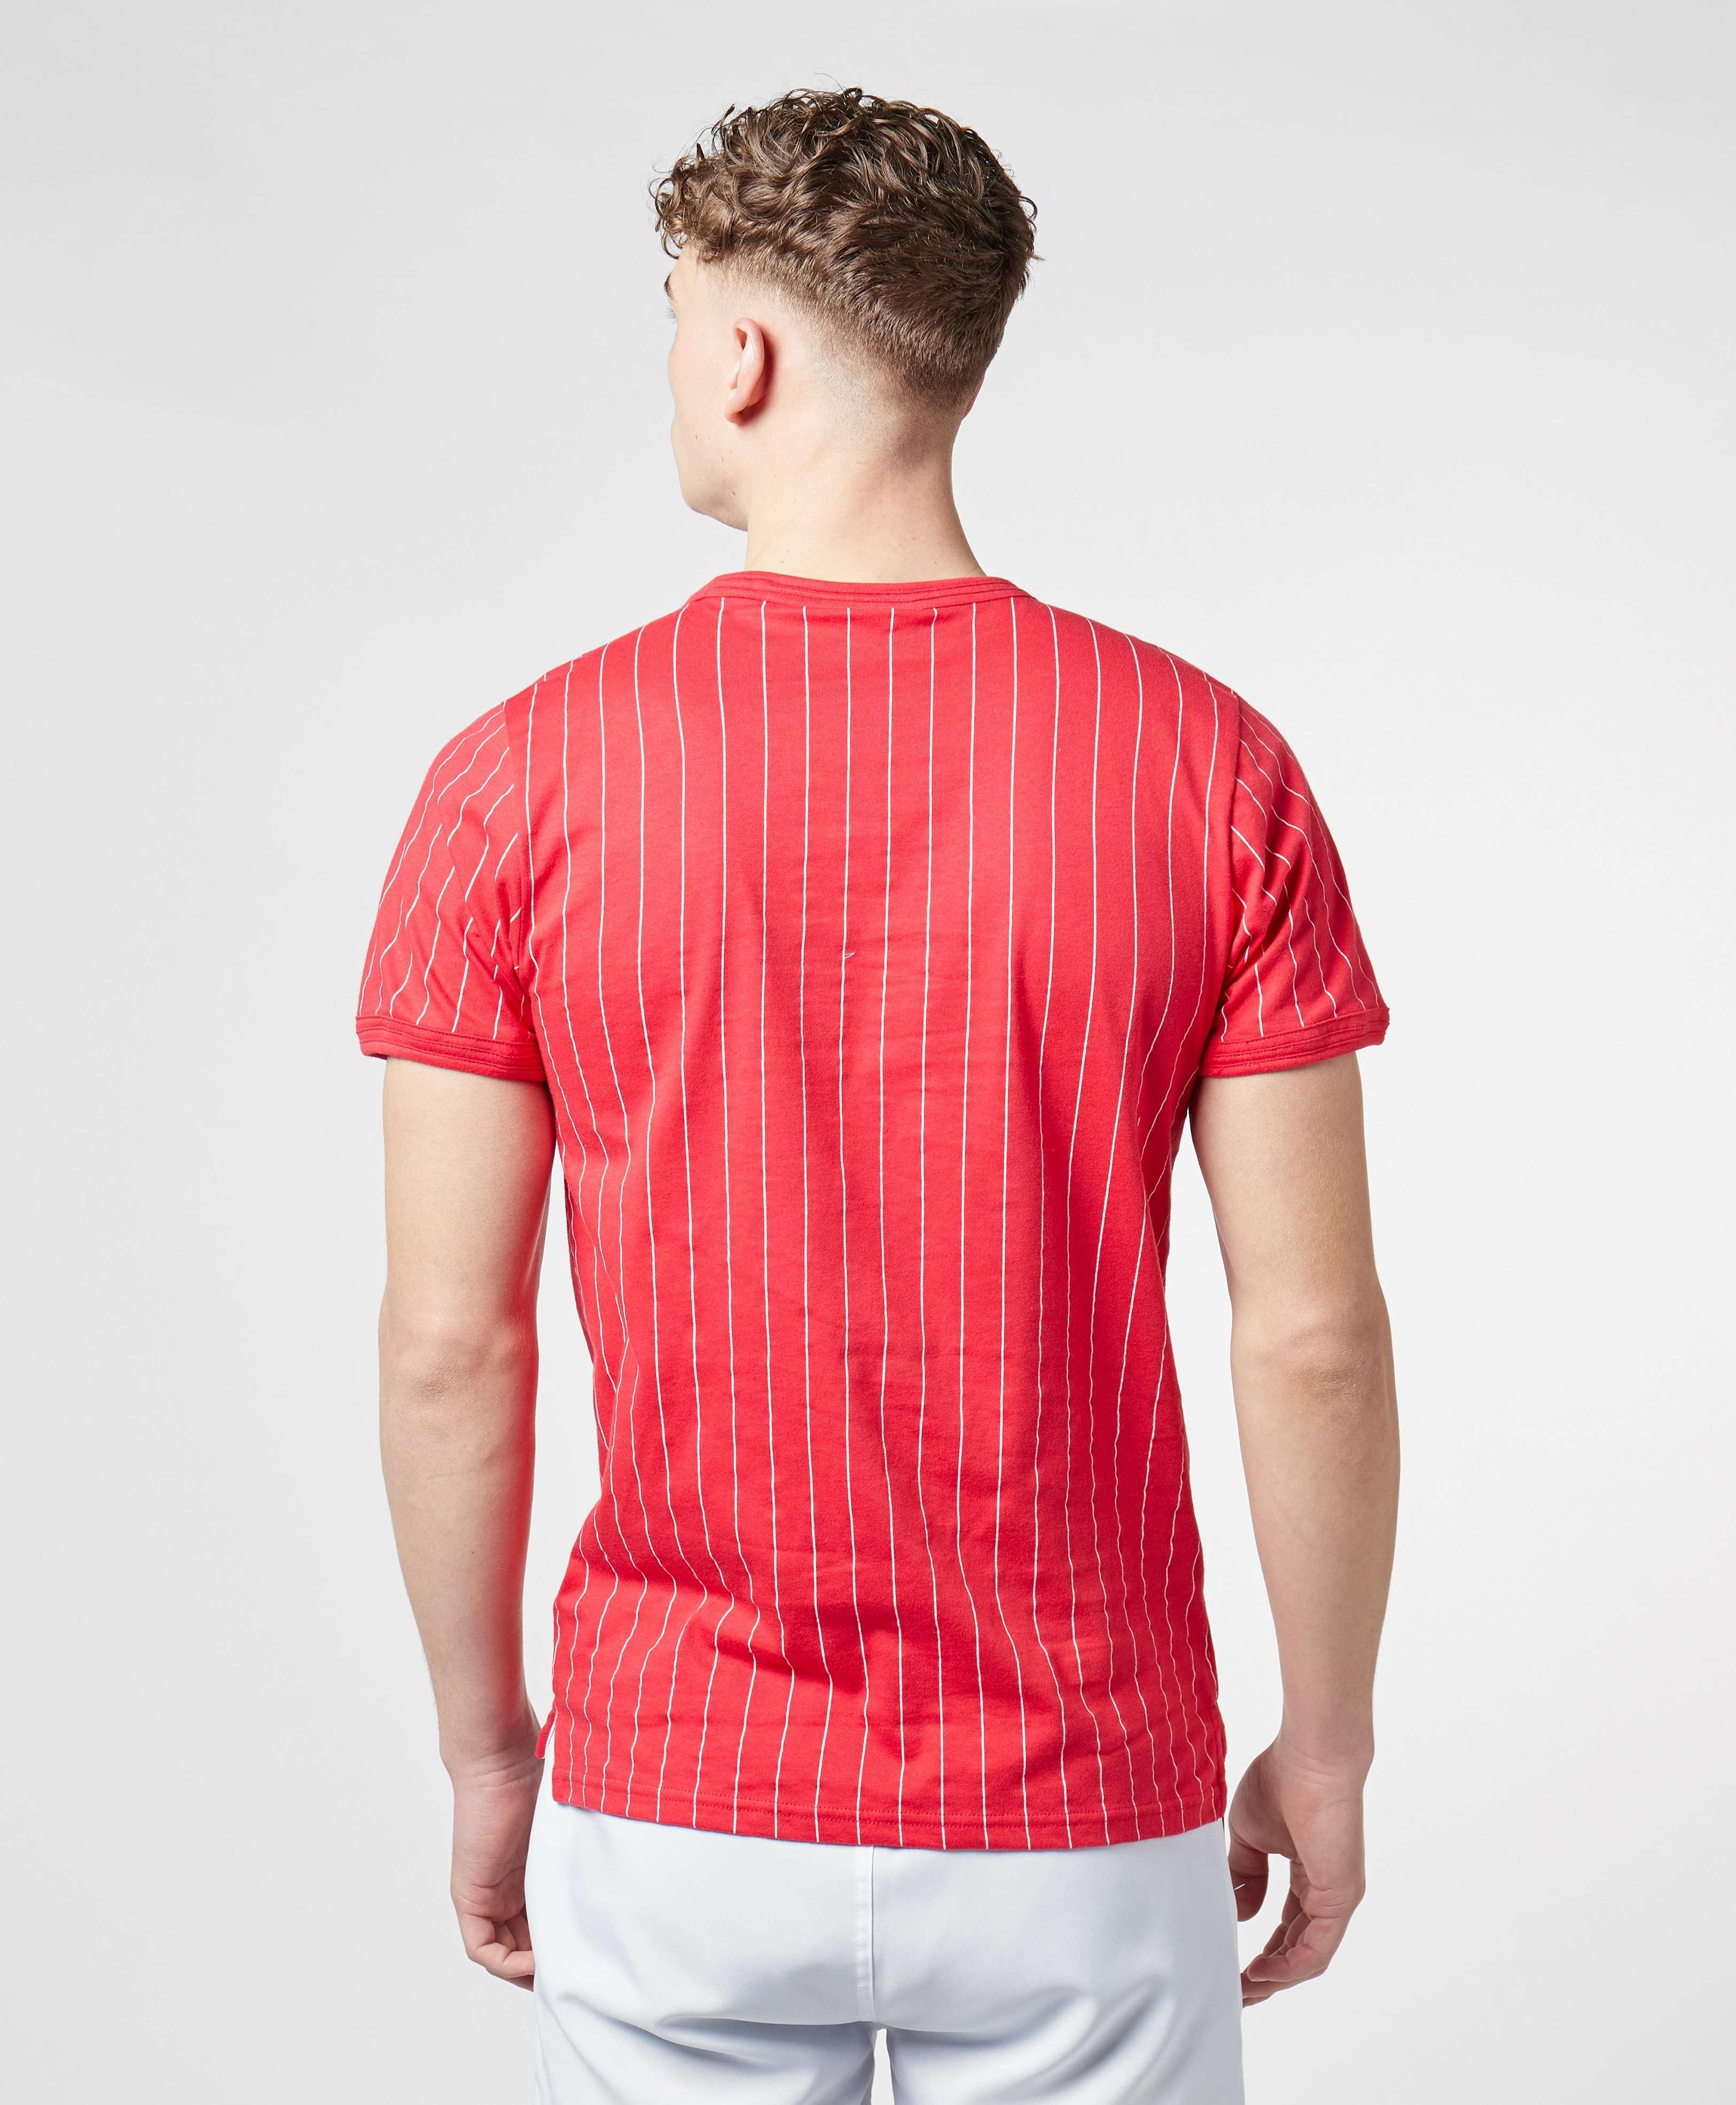 Fila Vertical Stripe Short Sleeve T-Shirt